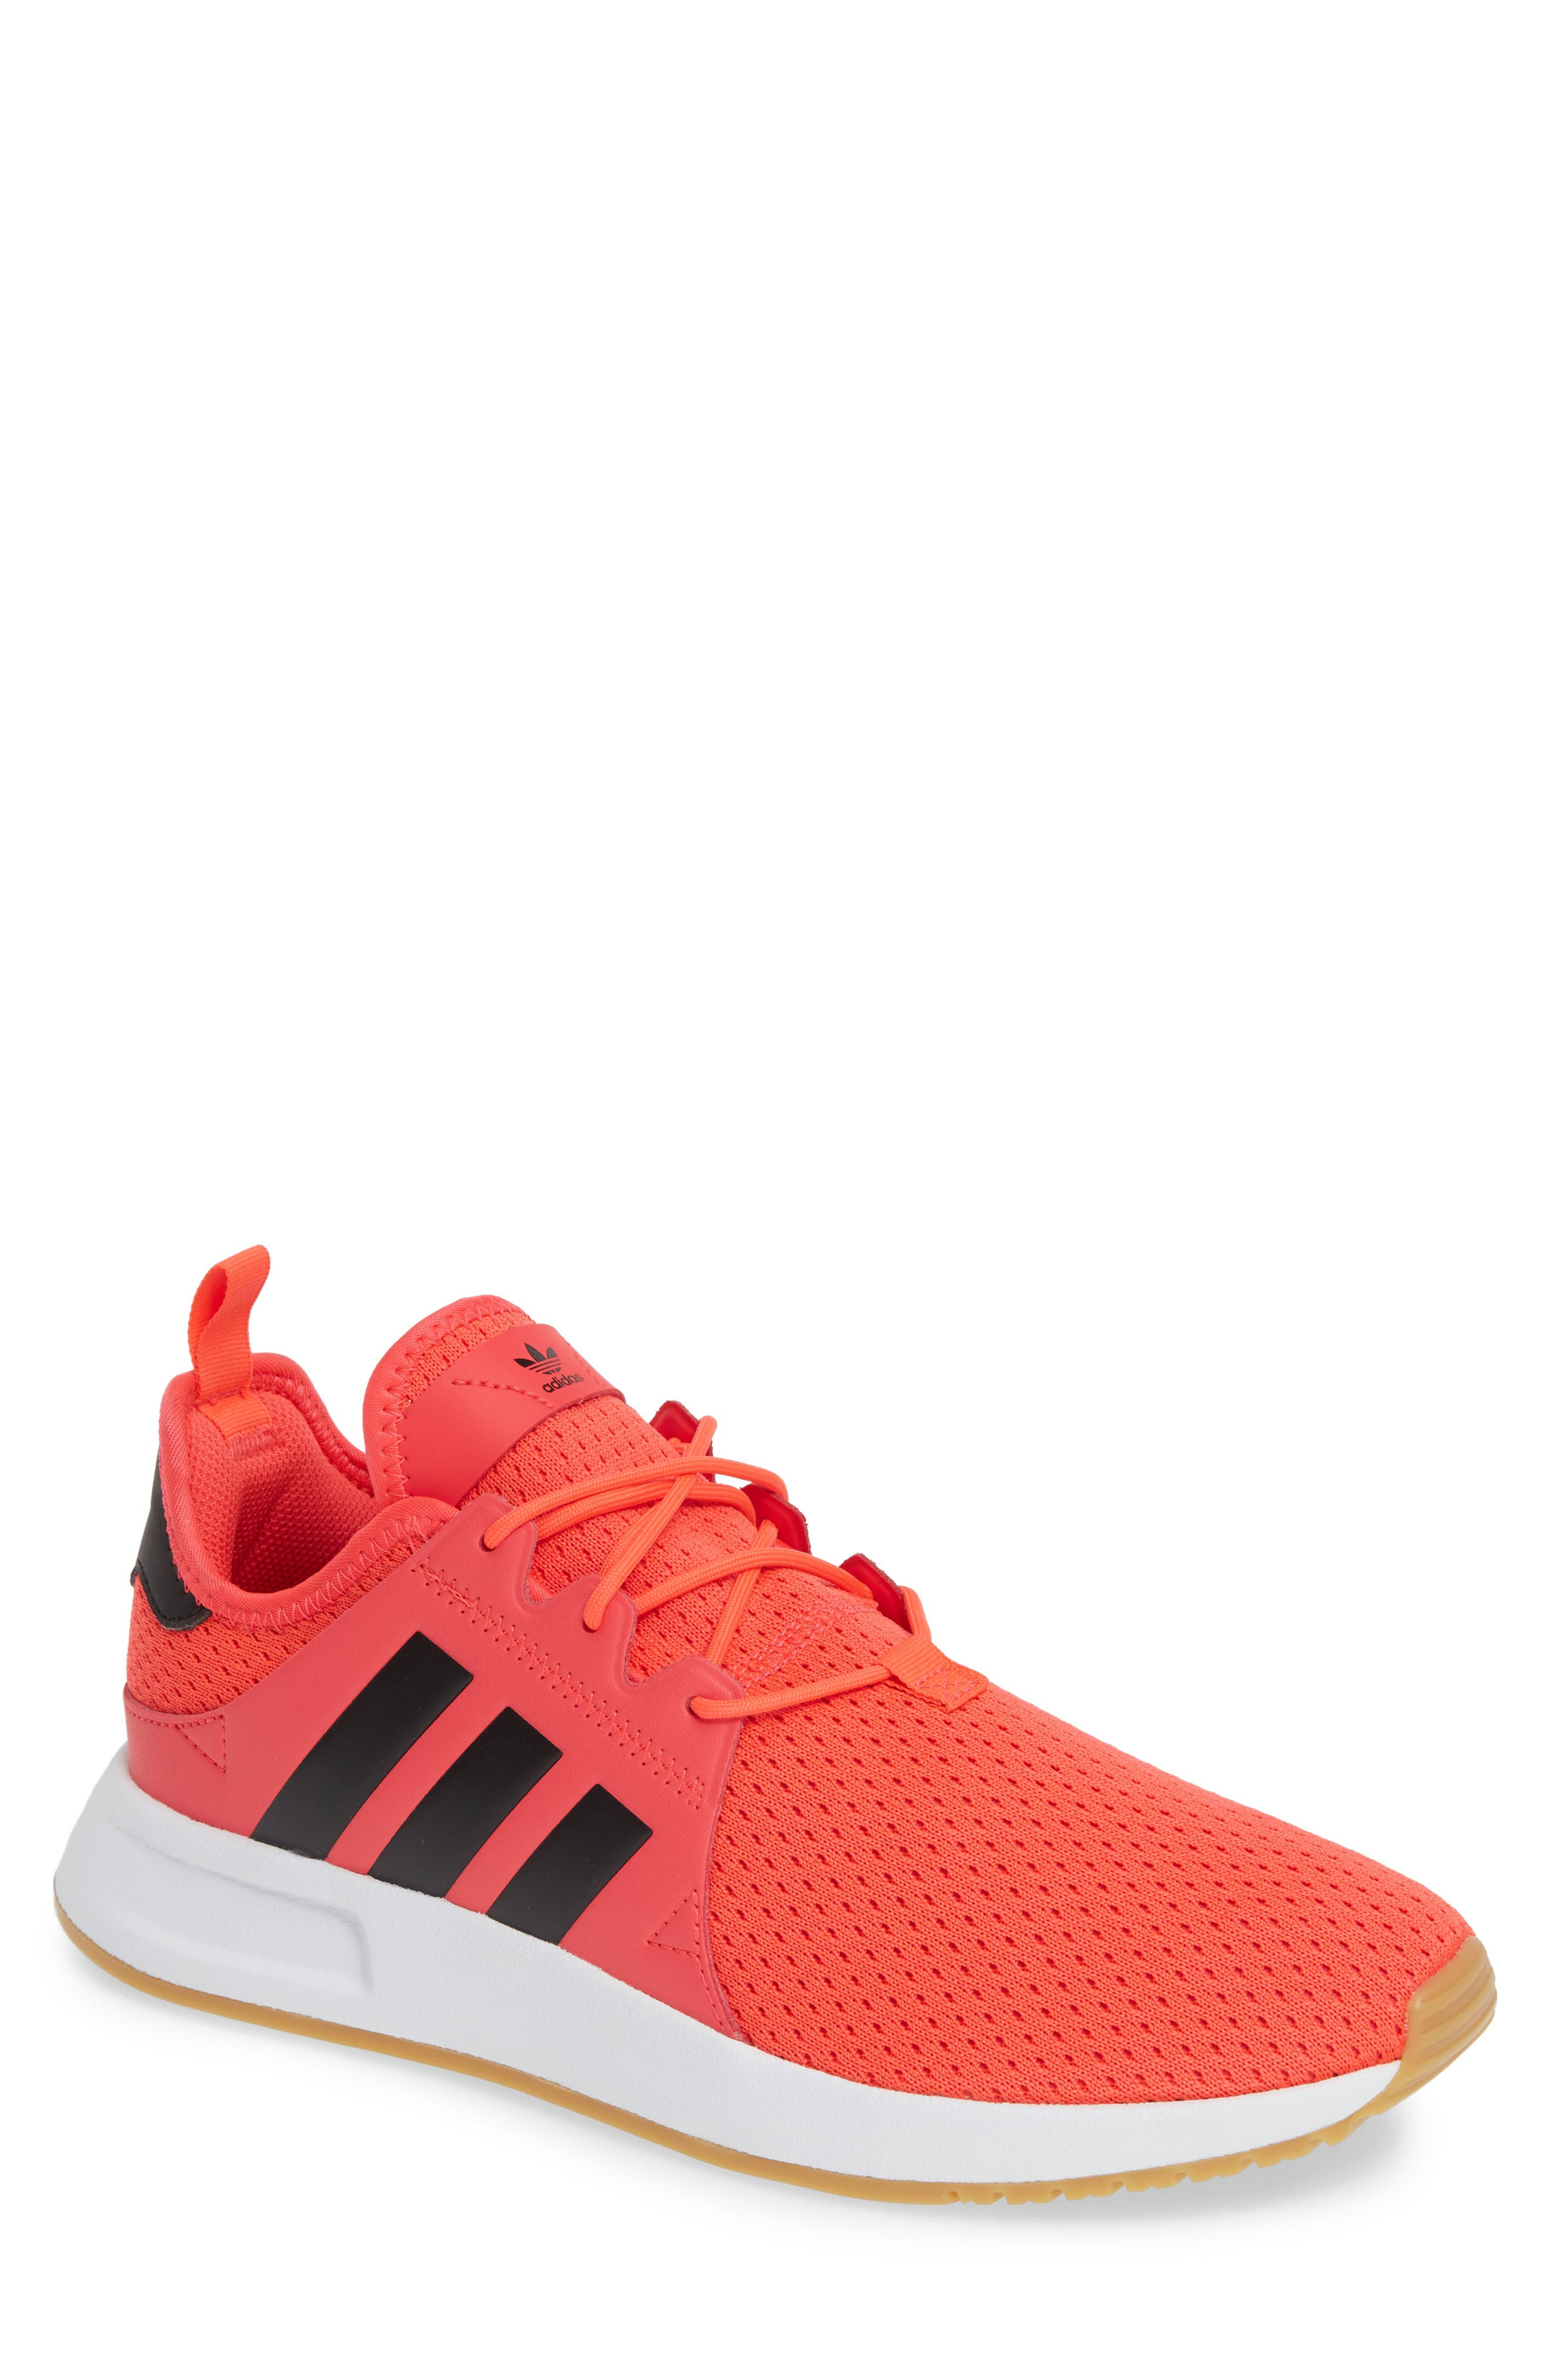 Adidas X Plr Sneaker, Red